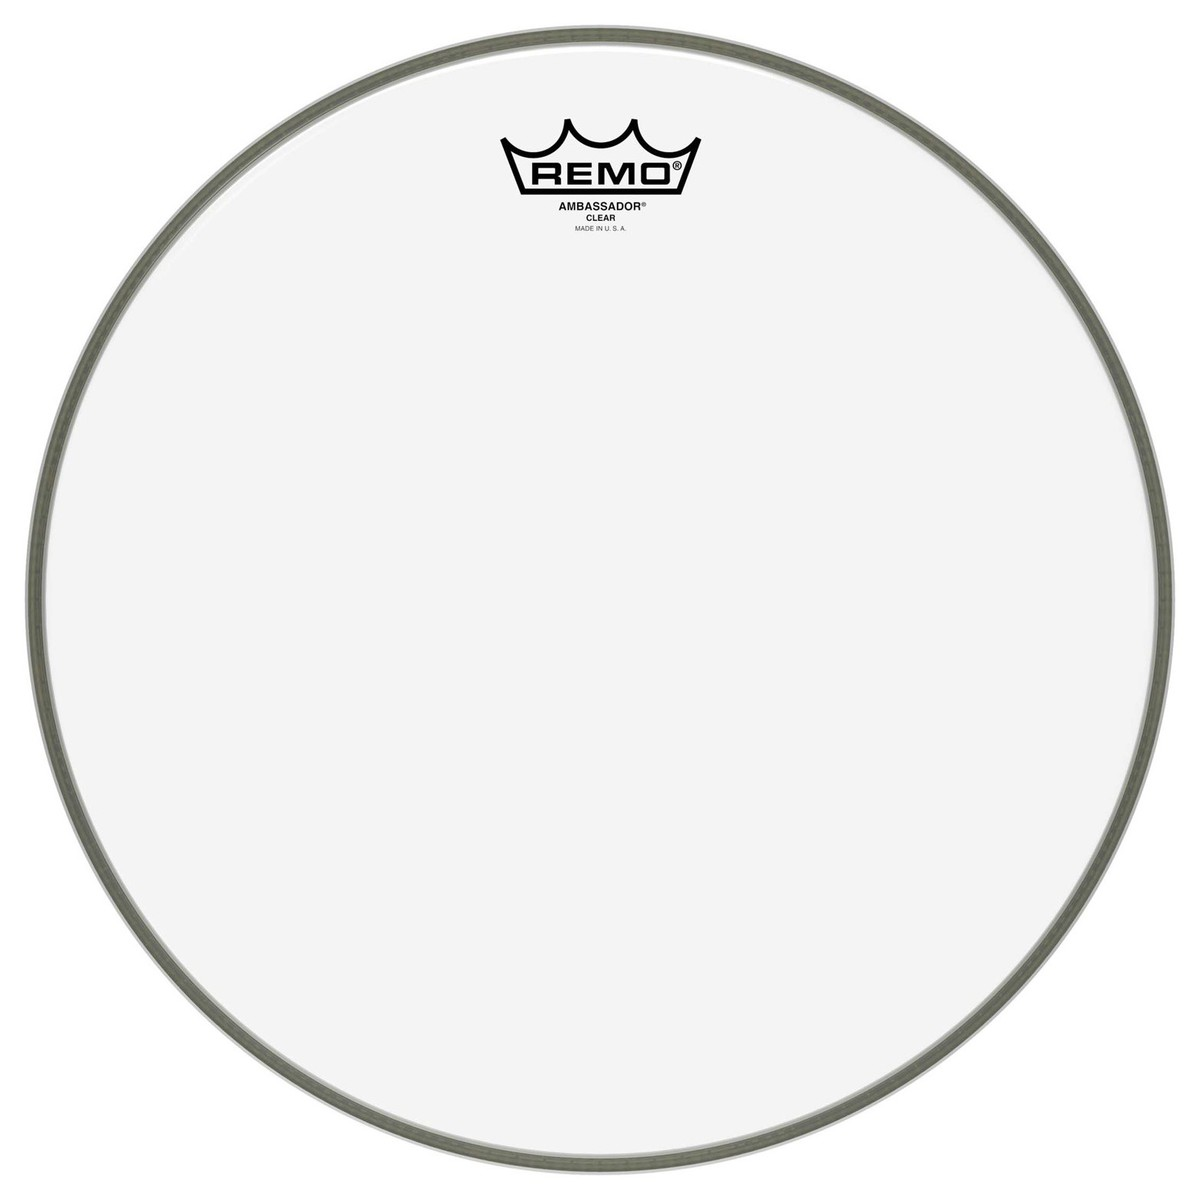 Remo Ambassador Clear 16 Drum Head